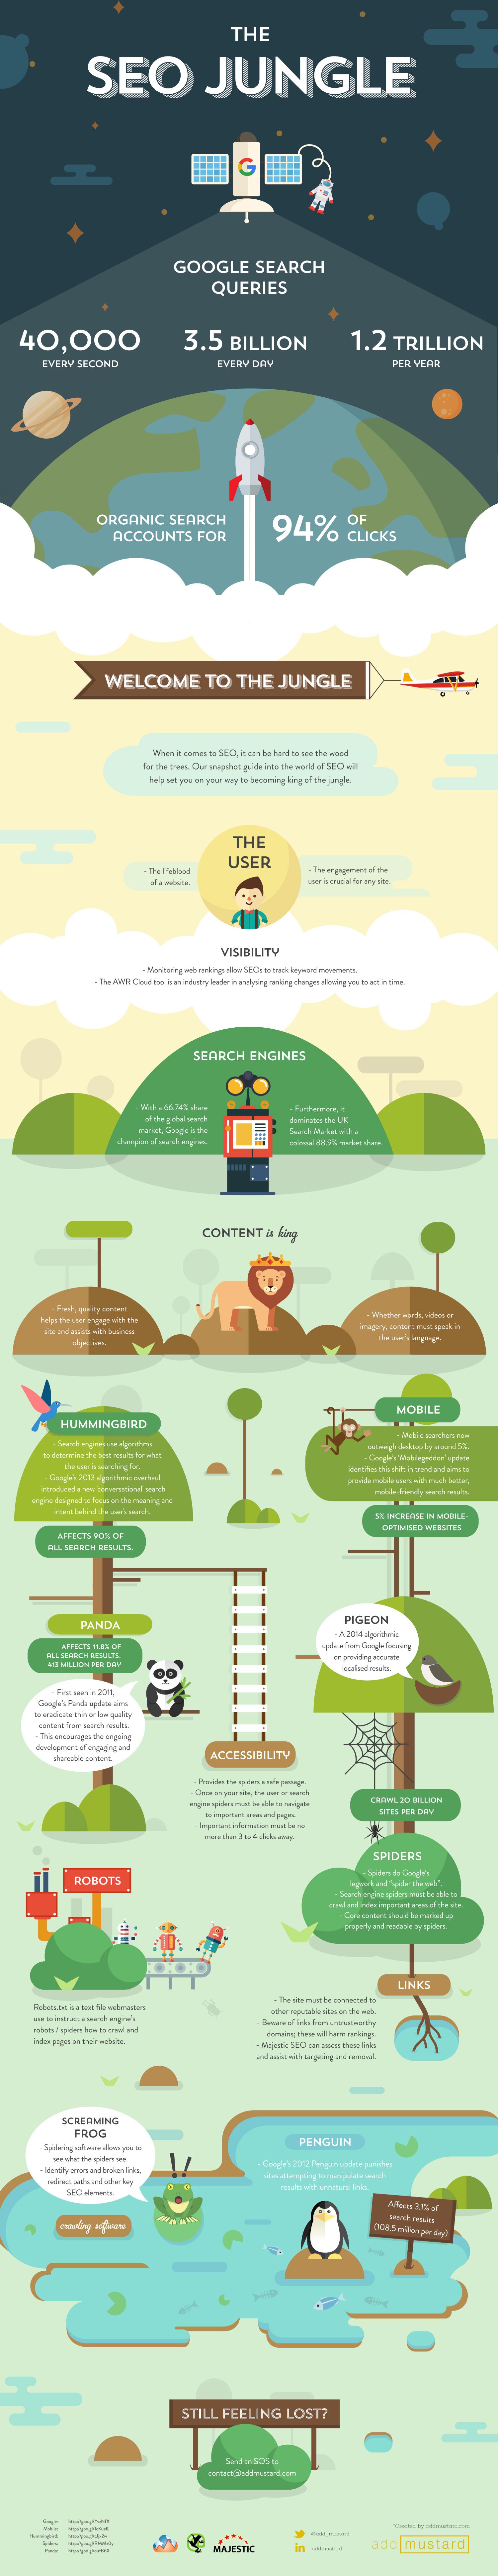 SEO_Jungle_infographic